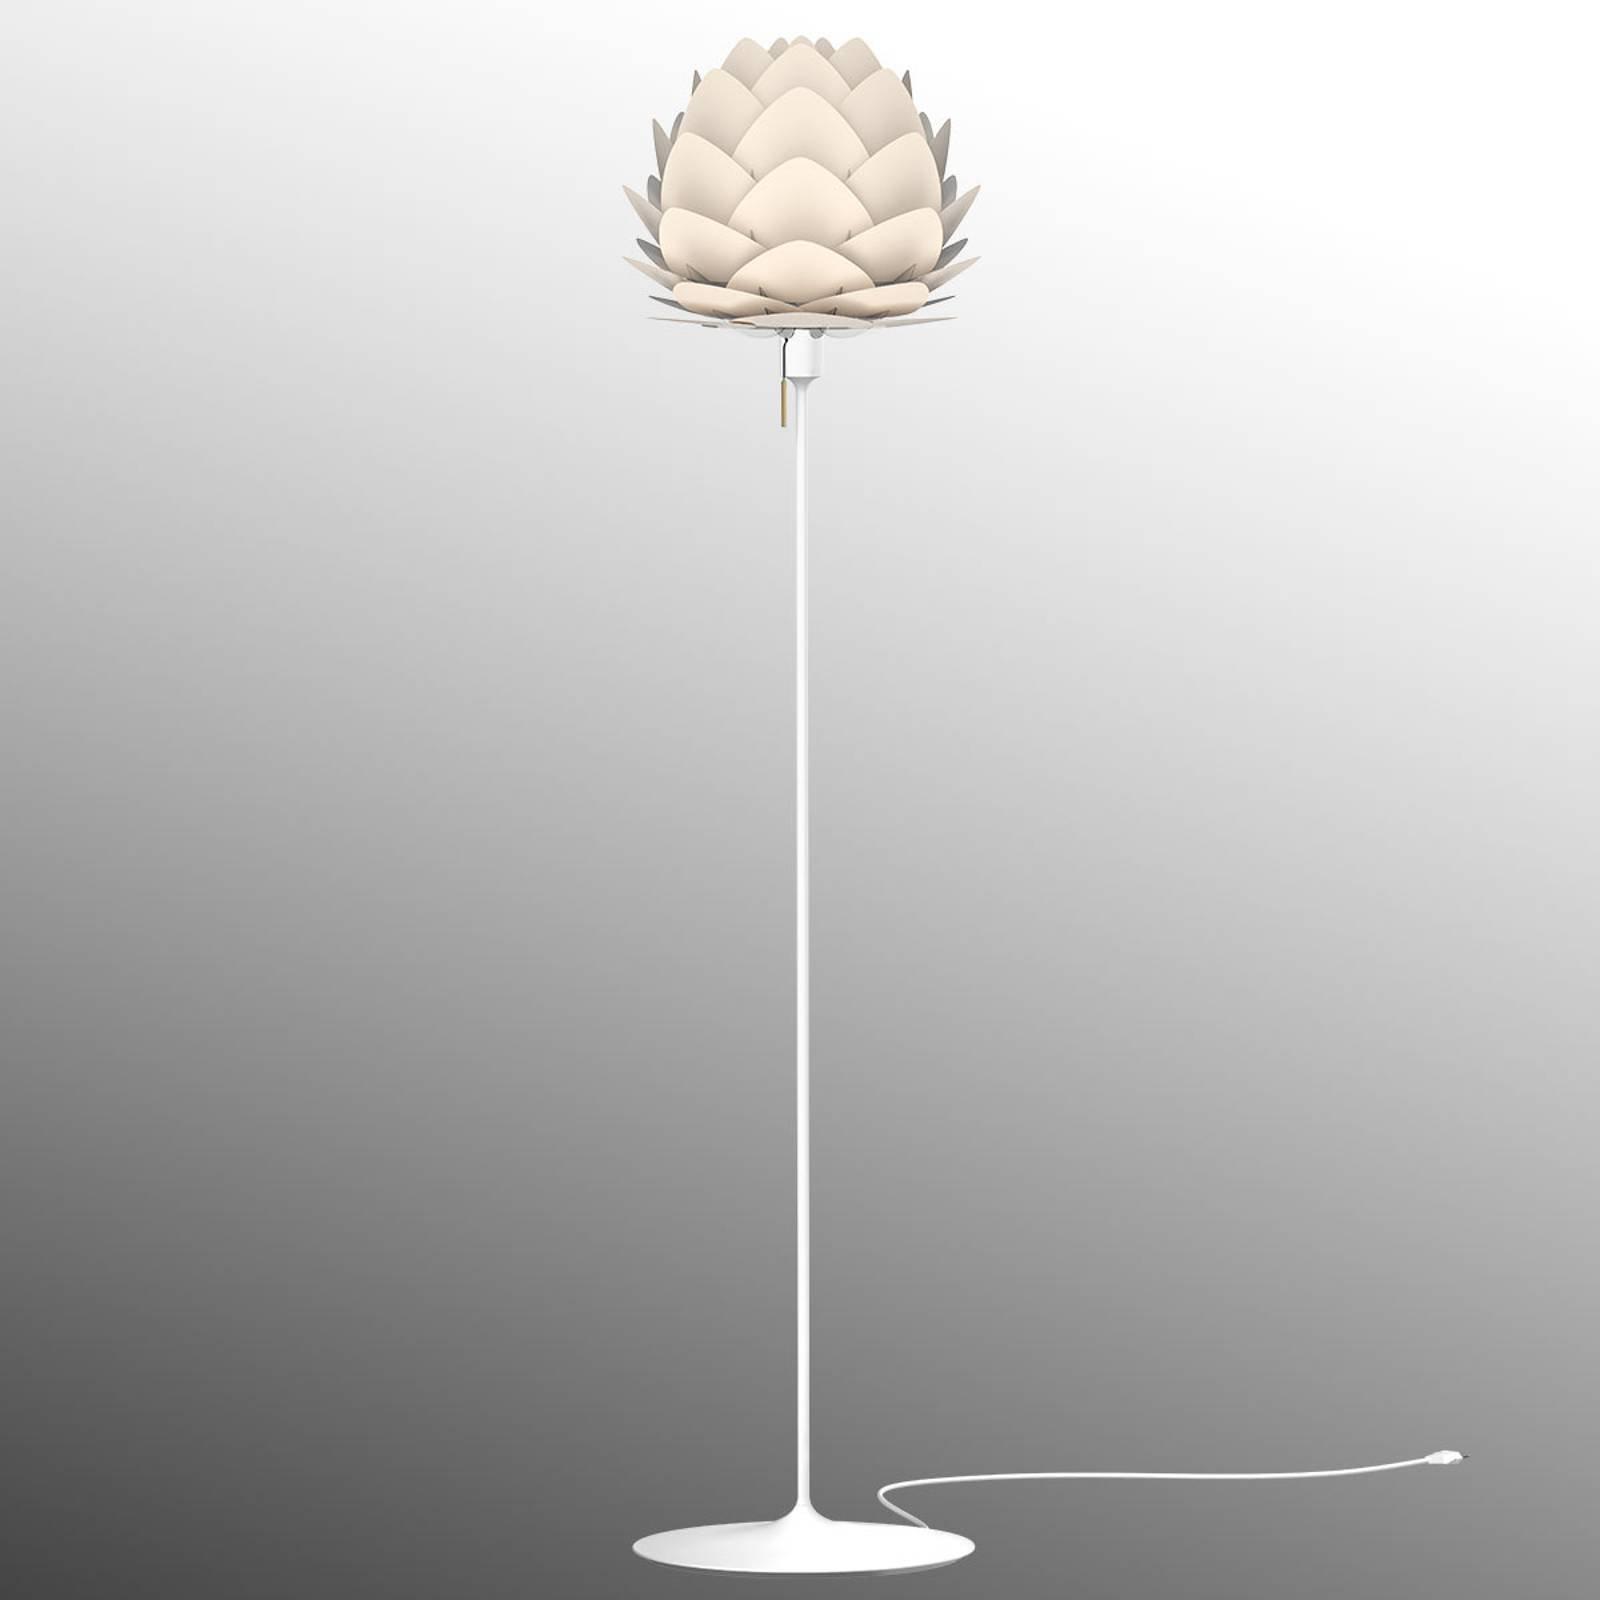 UMAGE Aluvia mini gulvlampe perlemor